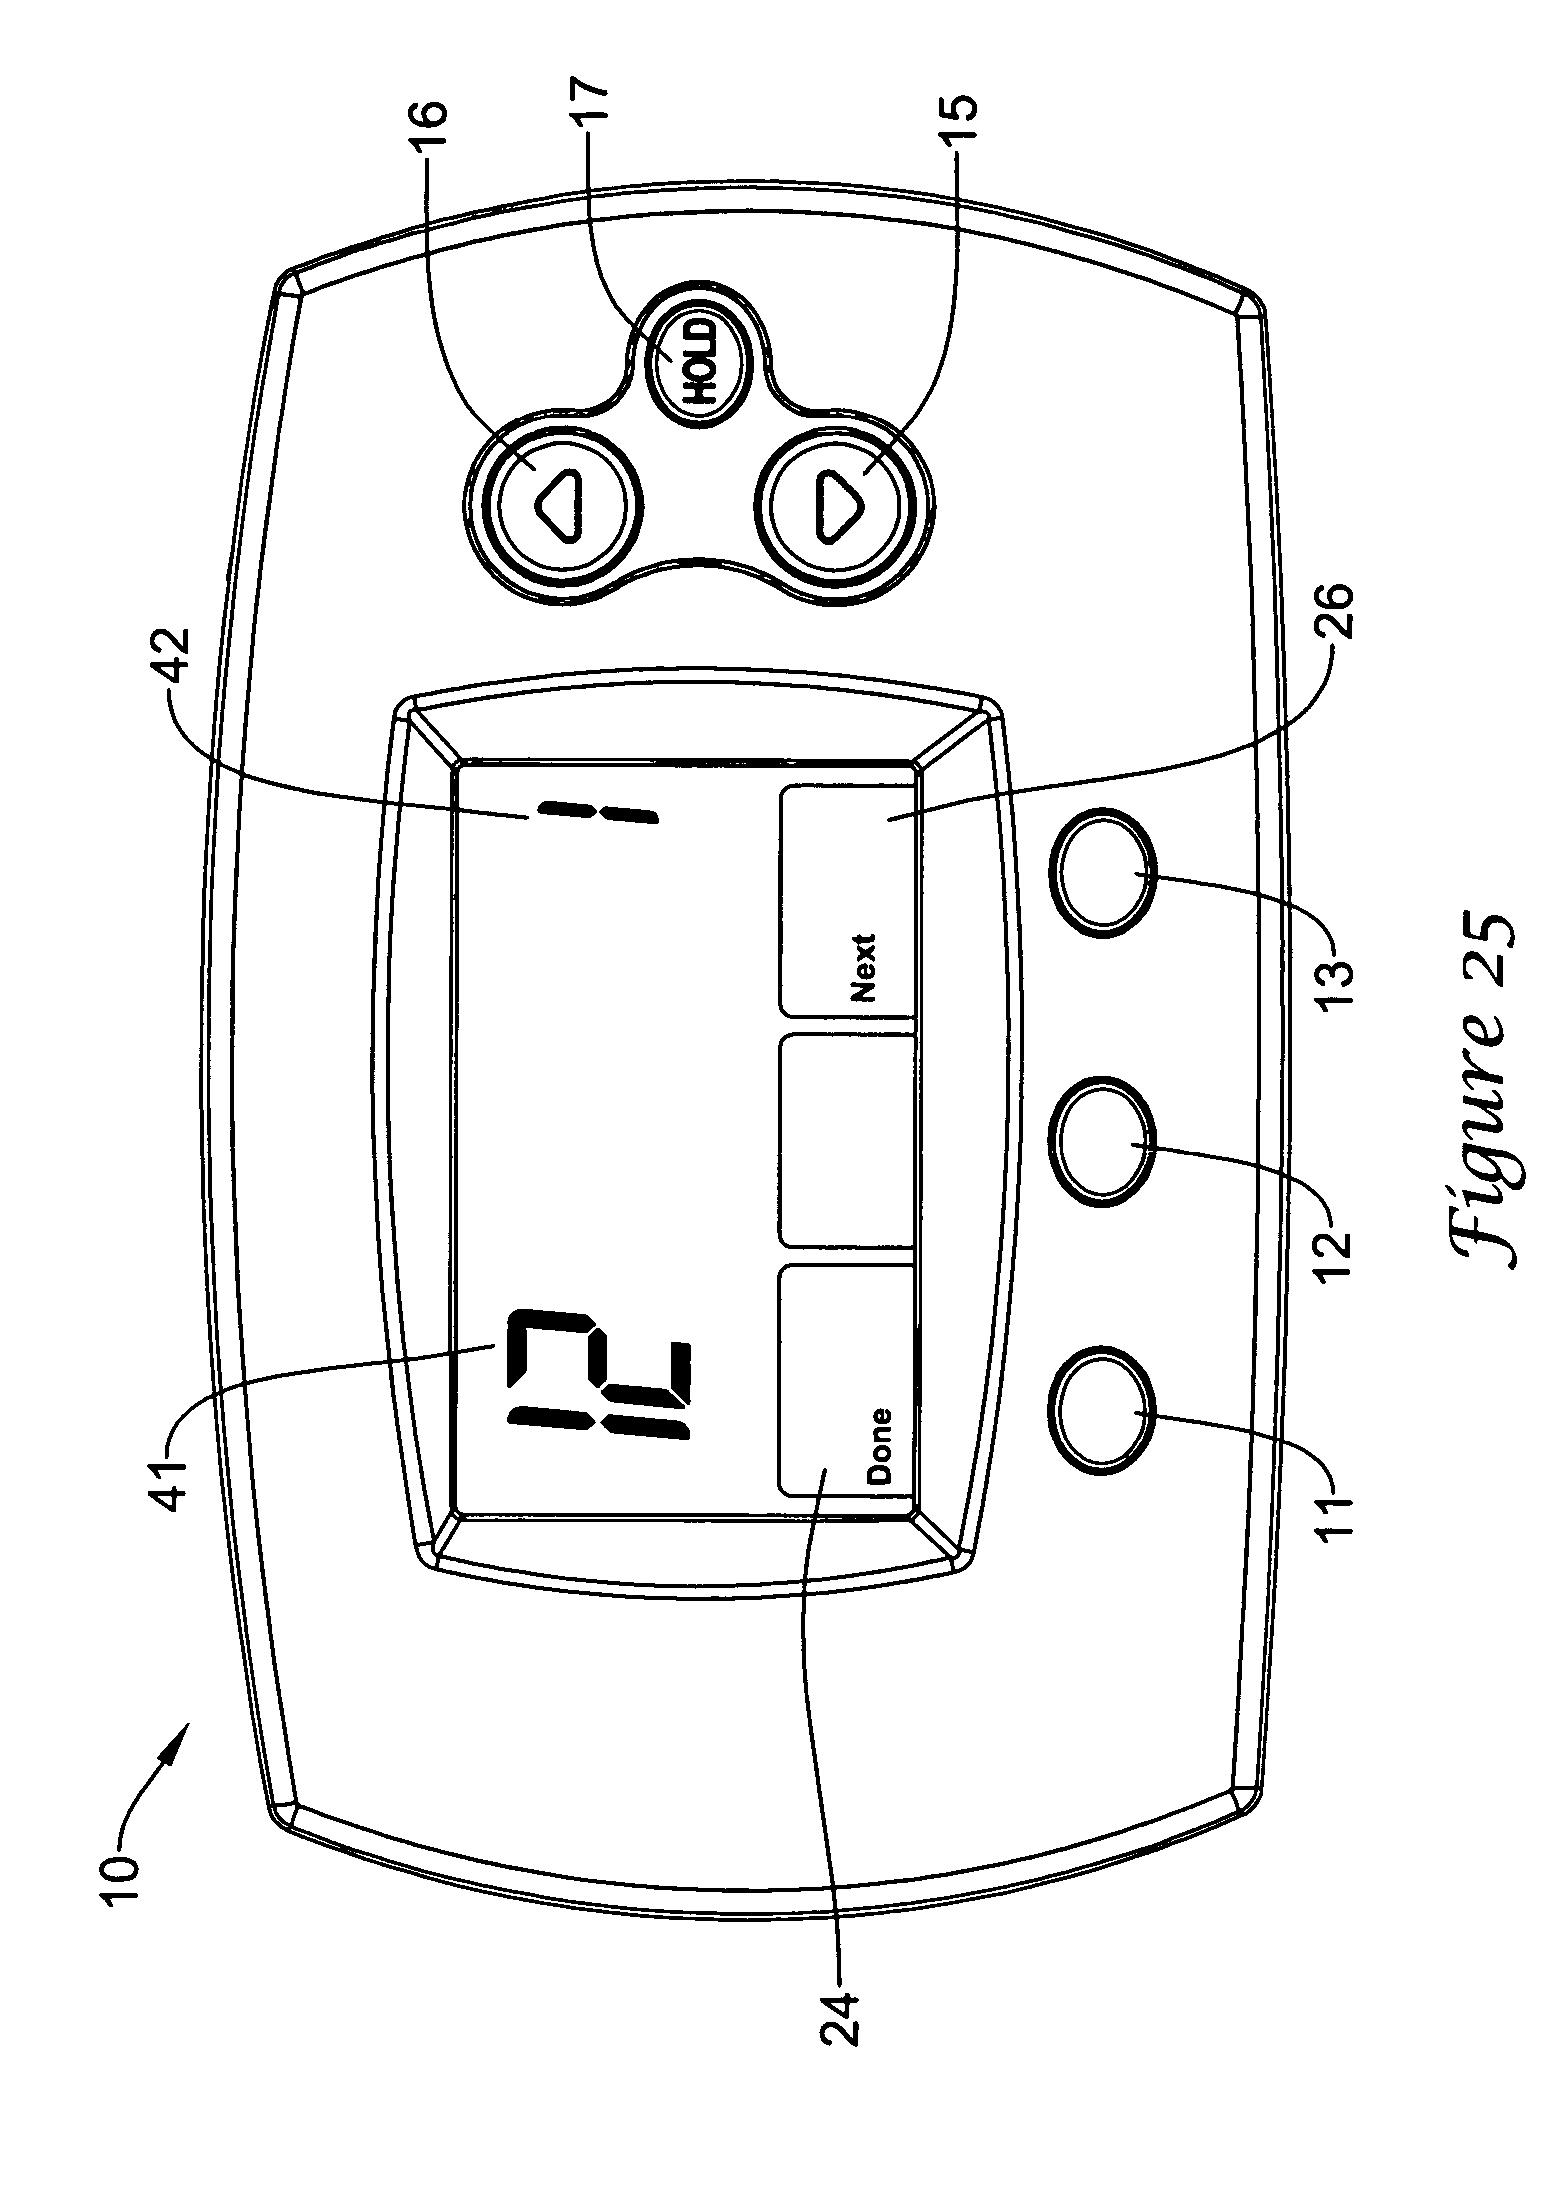 white rodgers thermostat wiring diagram 1f82 261 2003 jetta monsoon radio 1f80 37